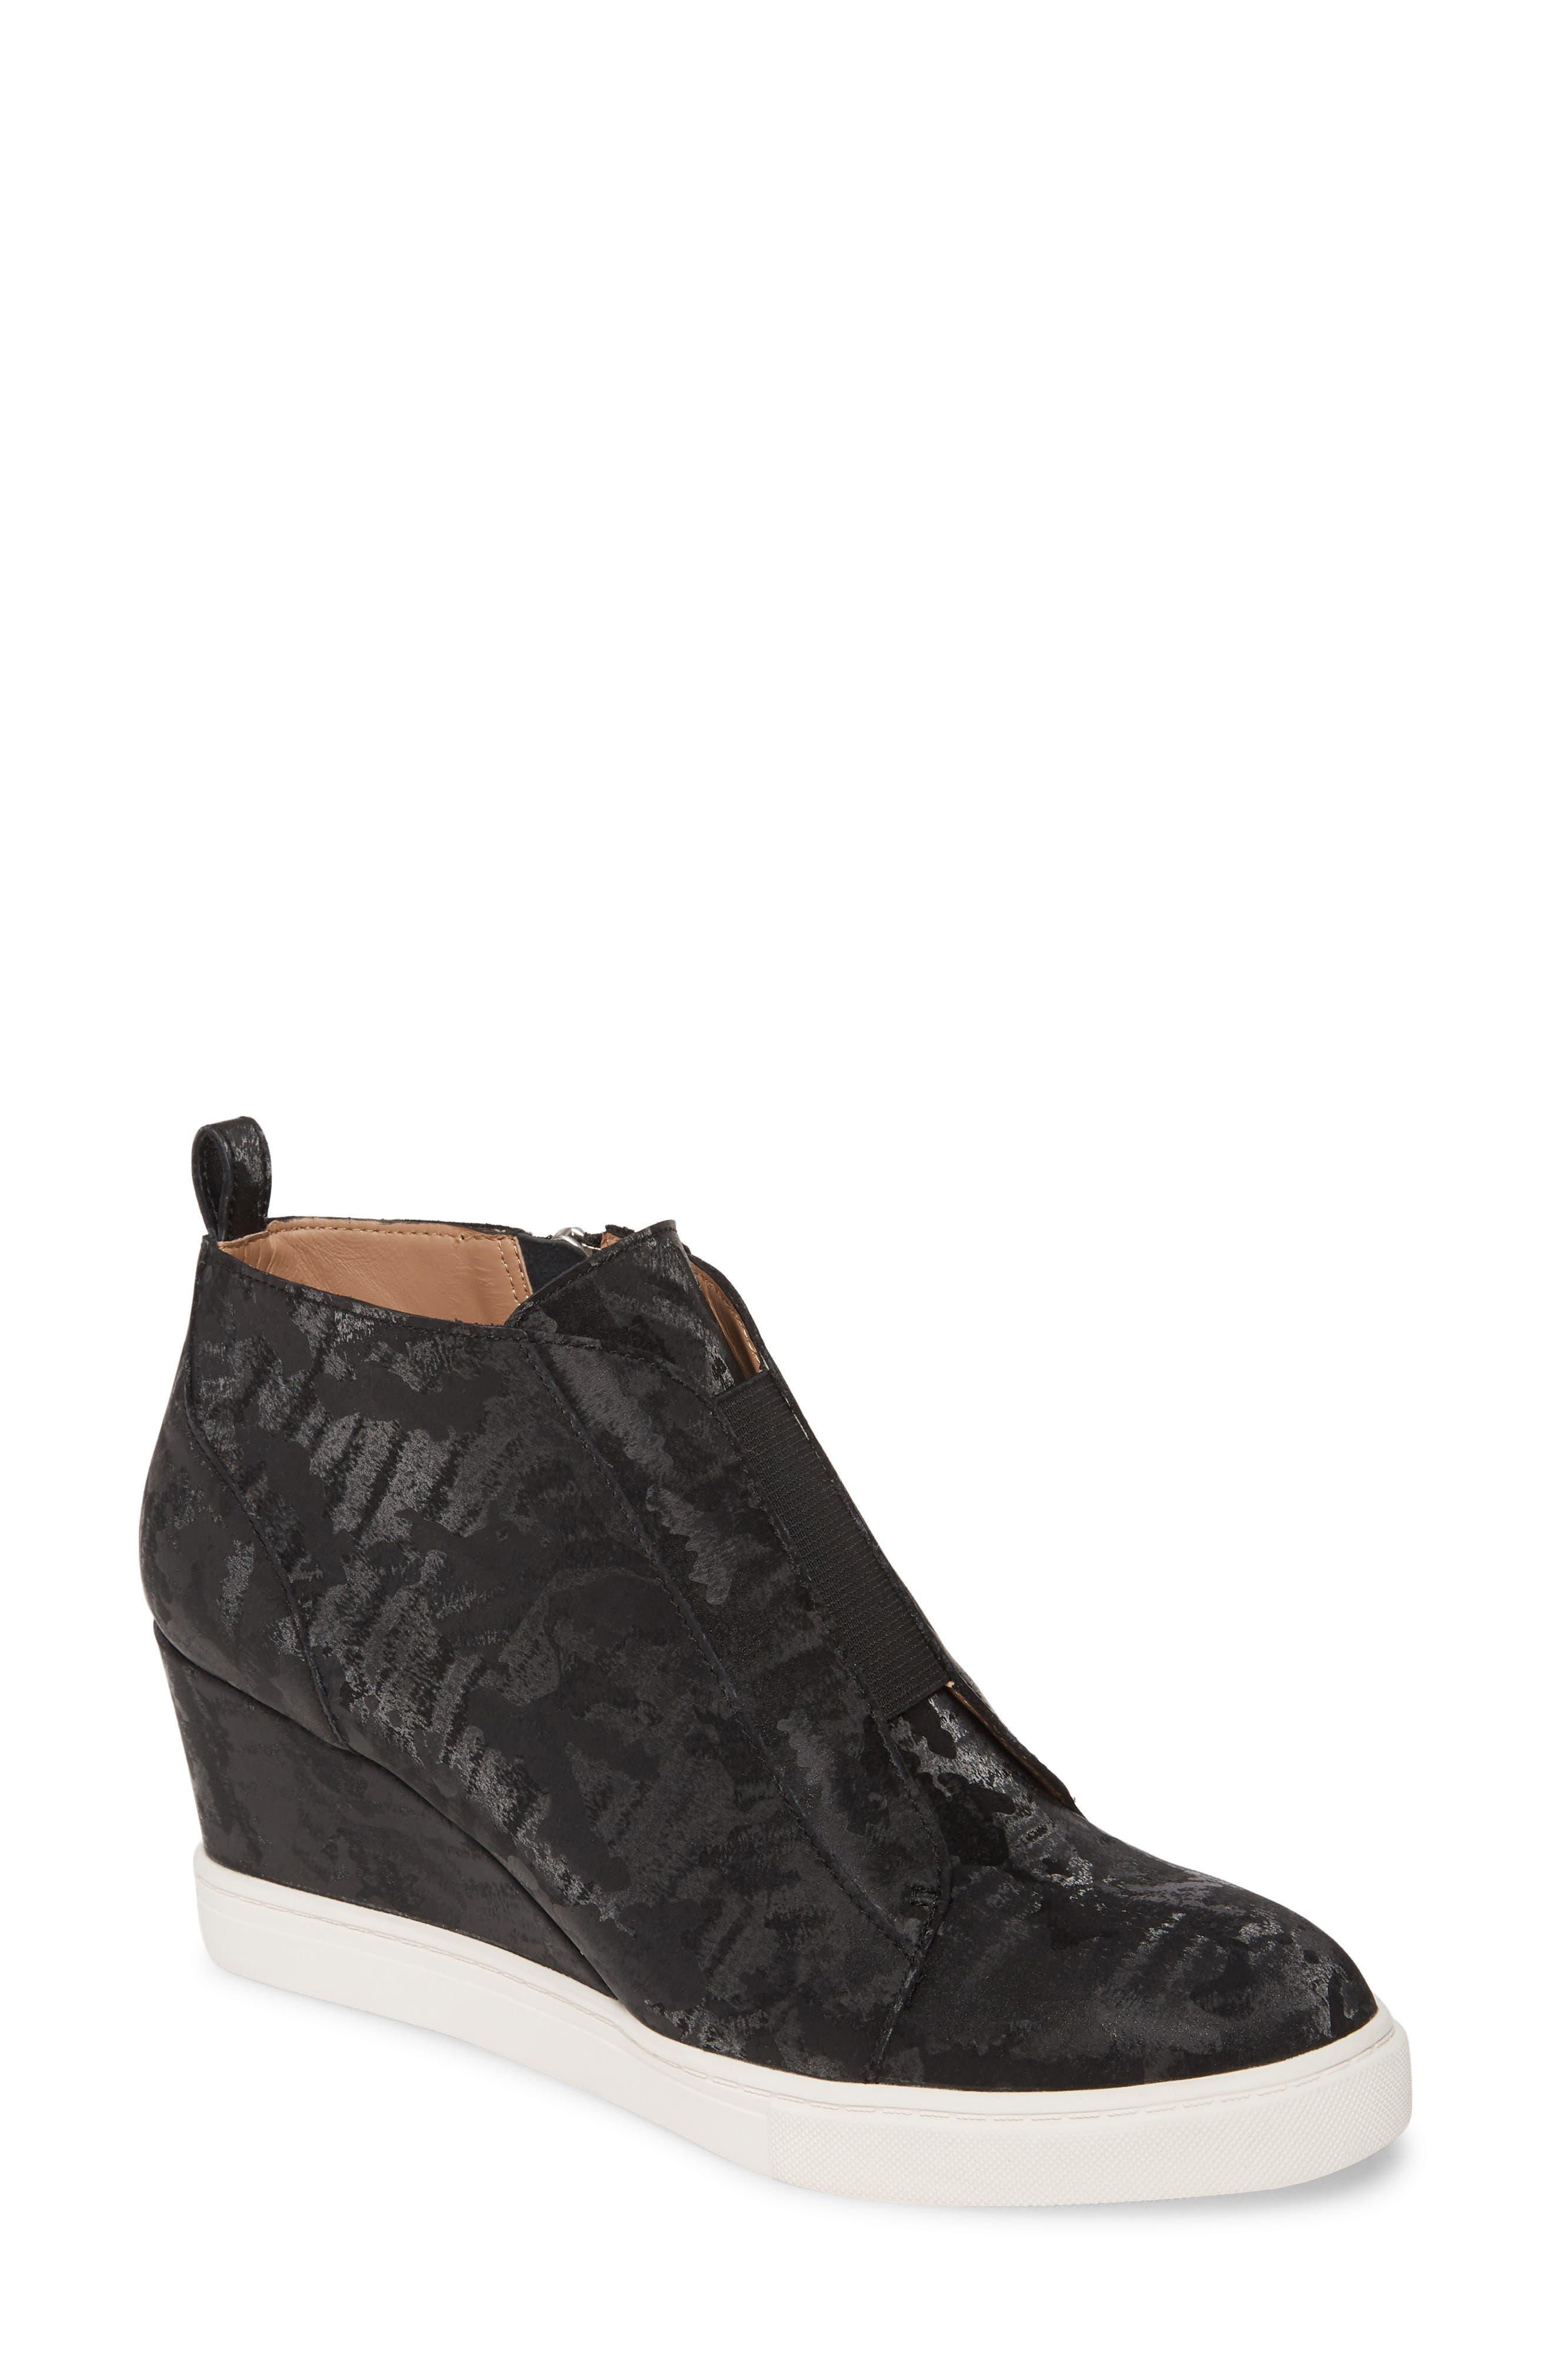 Felicia Iii Wedge Sneaker